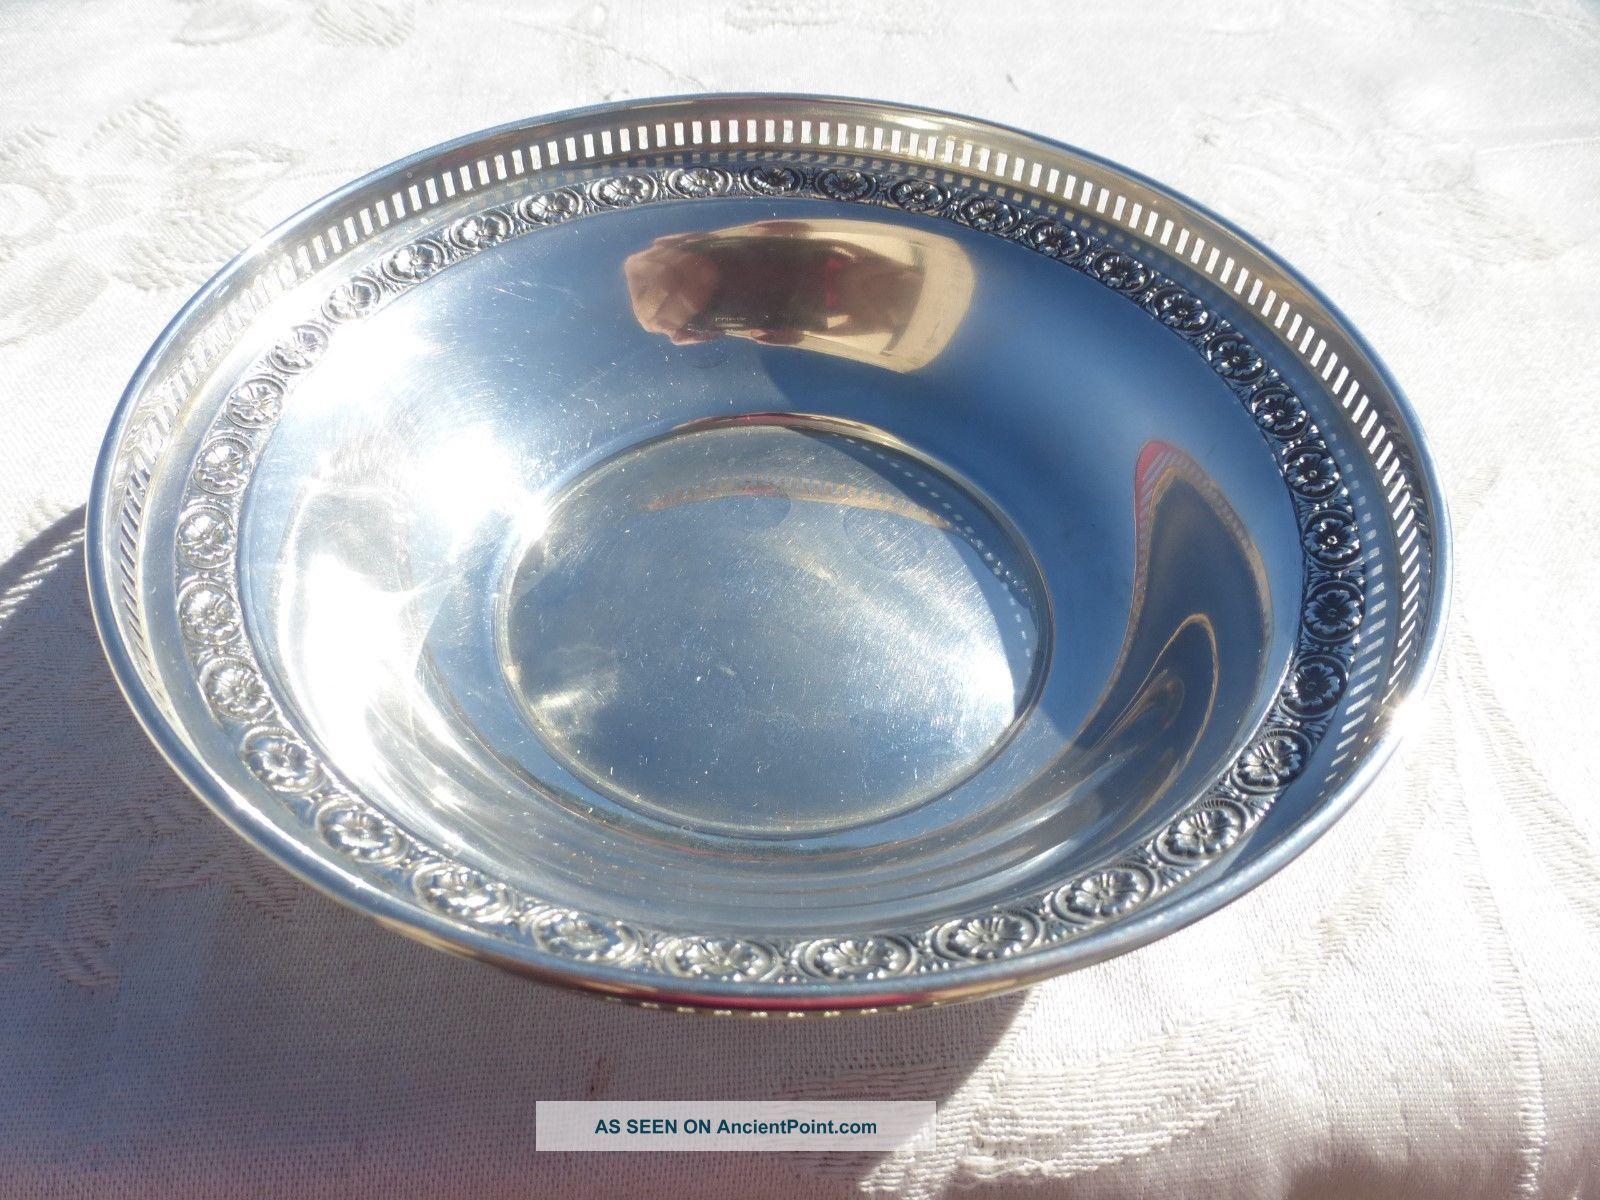 Vintage Sterling Silver Bowl Open Edge Work Workmanship Bowls photo